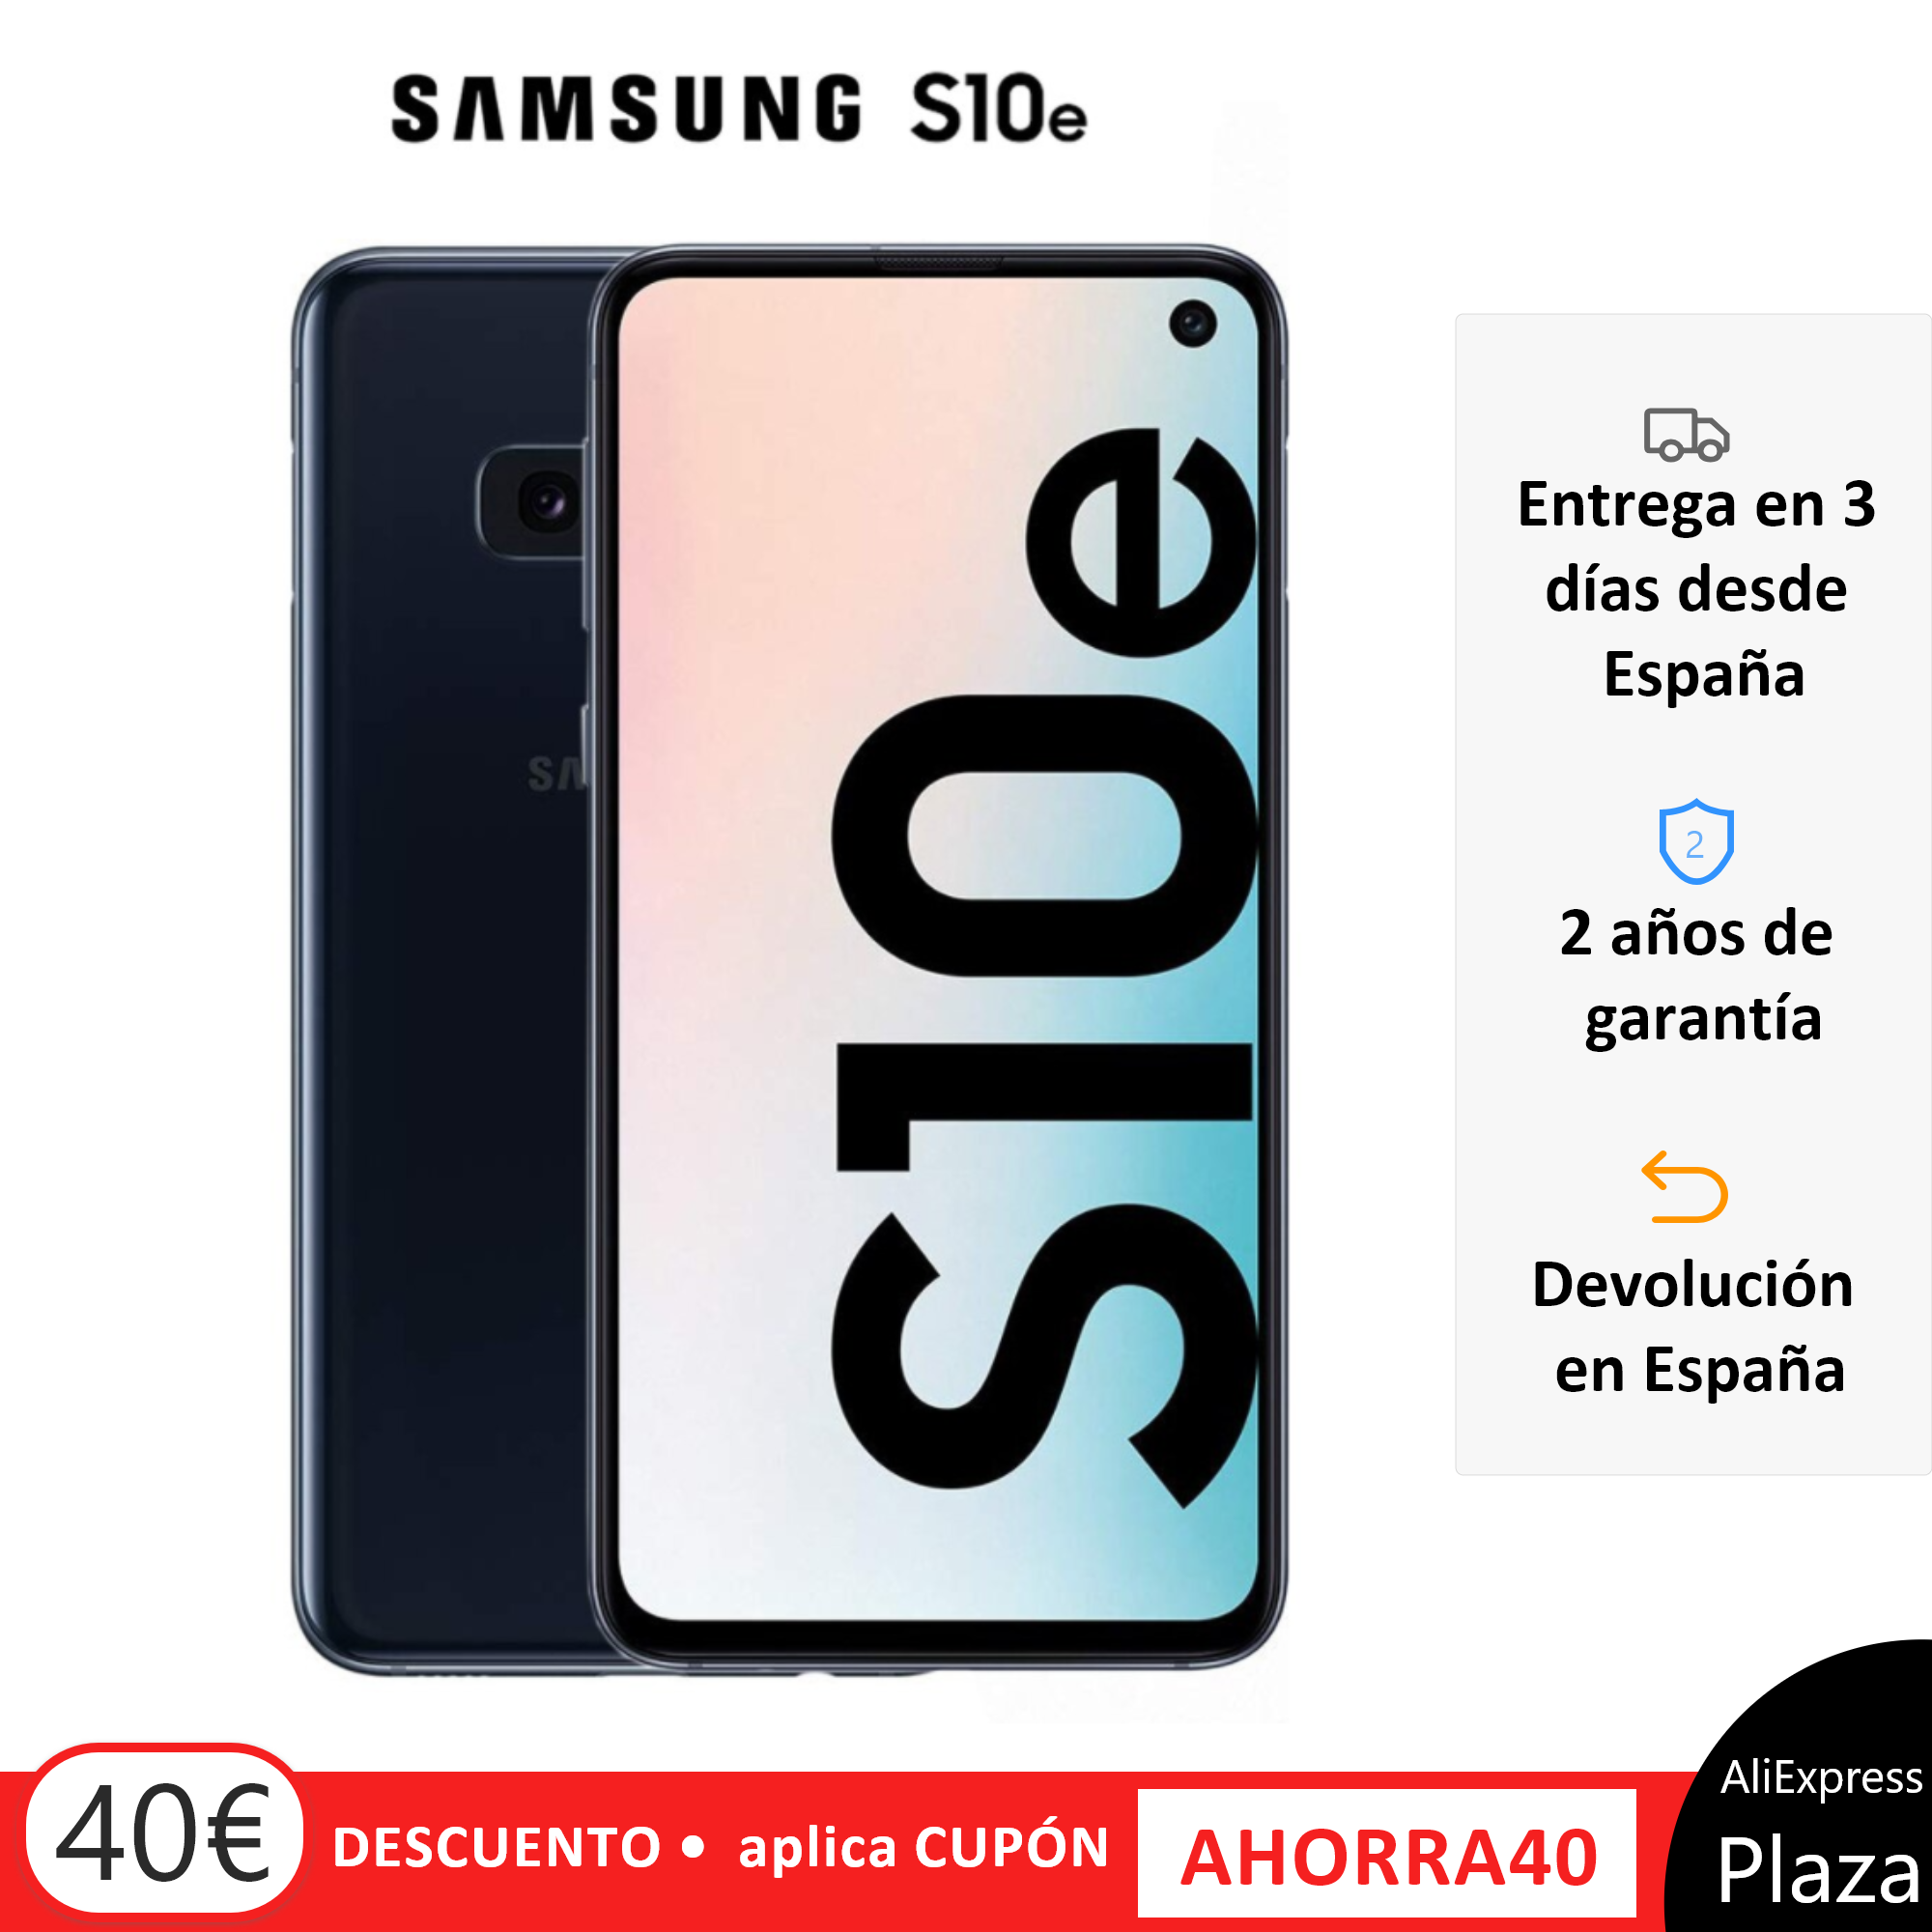 Samsung Galaxy S10e, Black Color (Prism Black), Band LTE/WiFi, Dual SIM, Internal 128 GB De Memoria, Screen 5.8